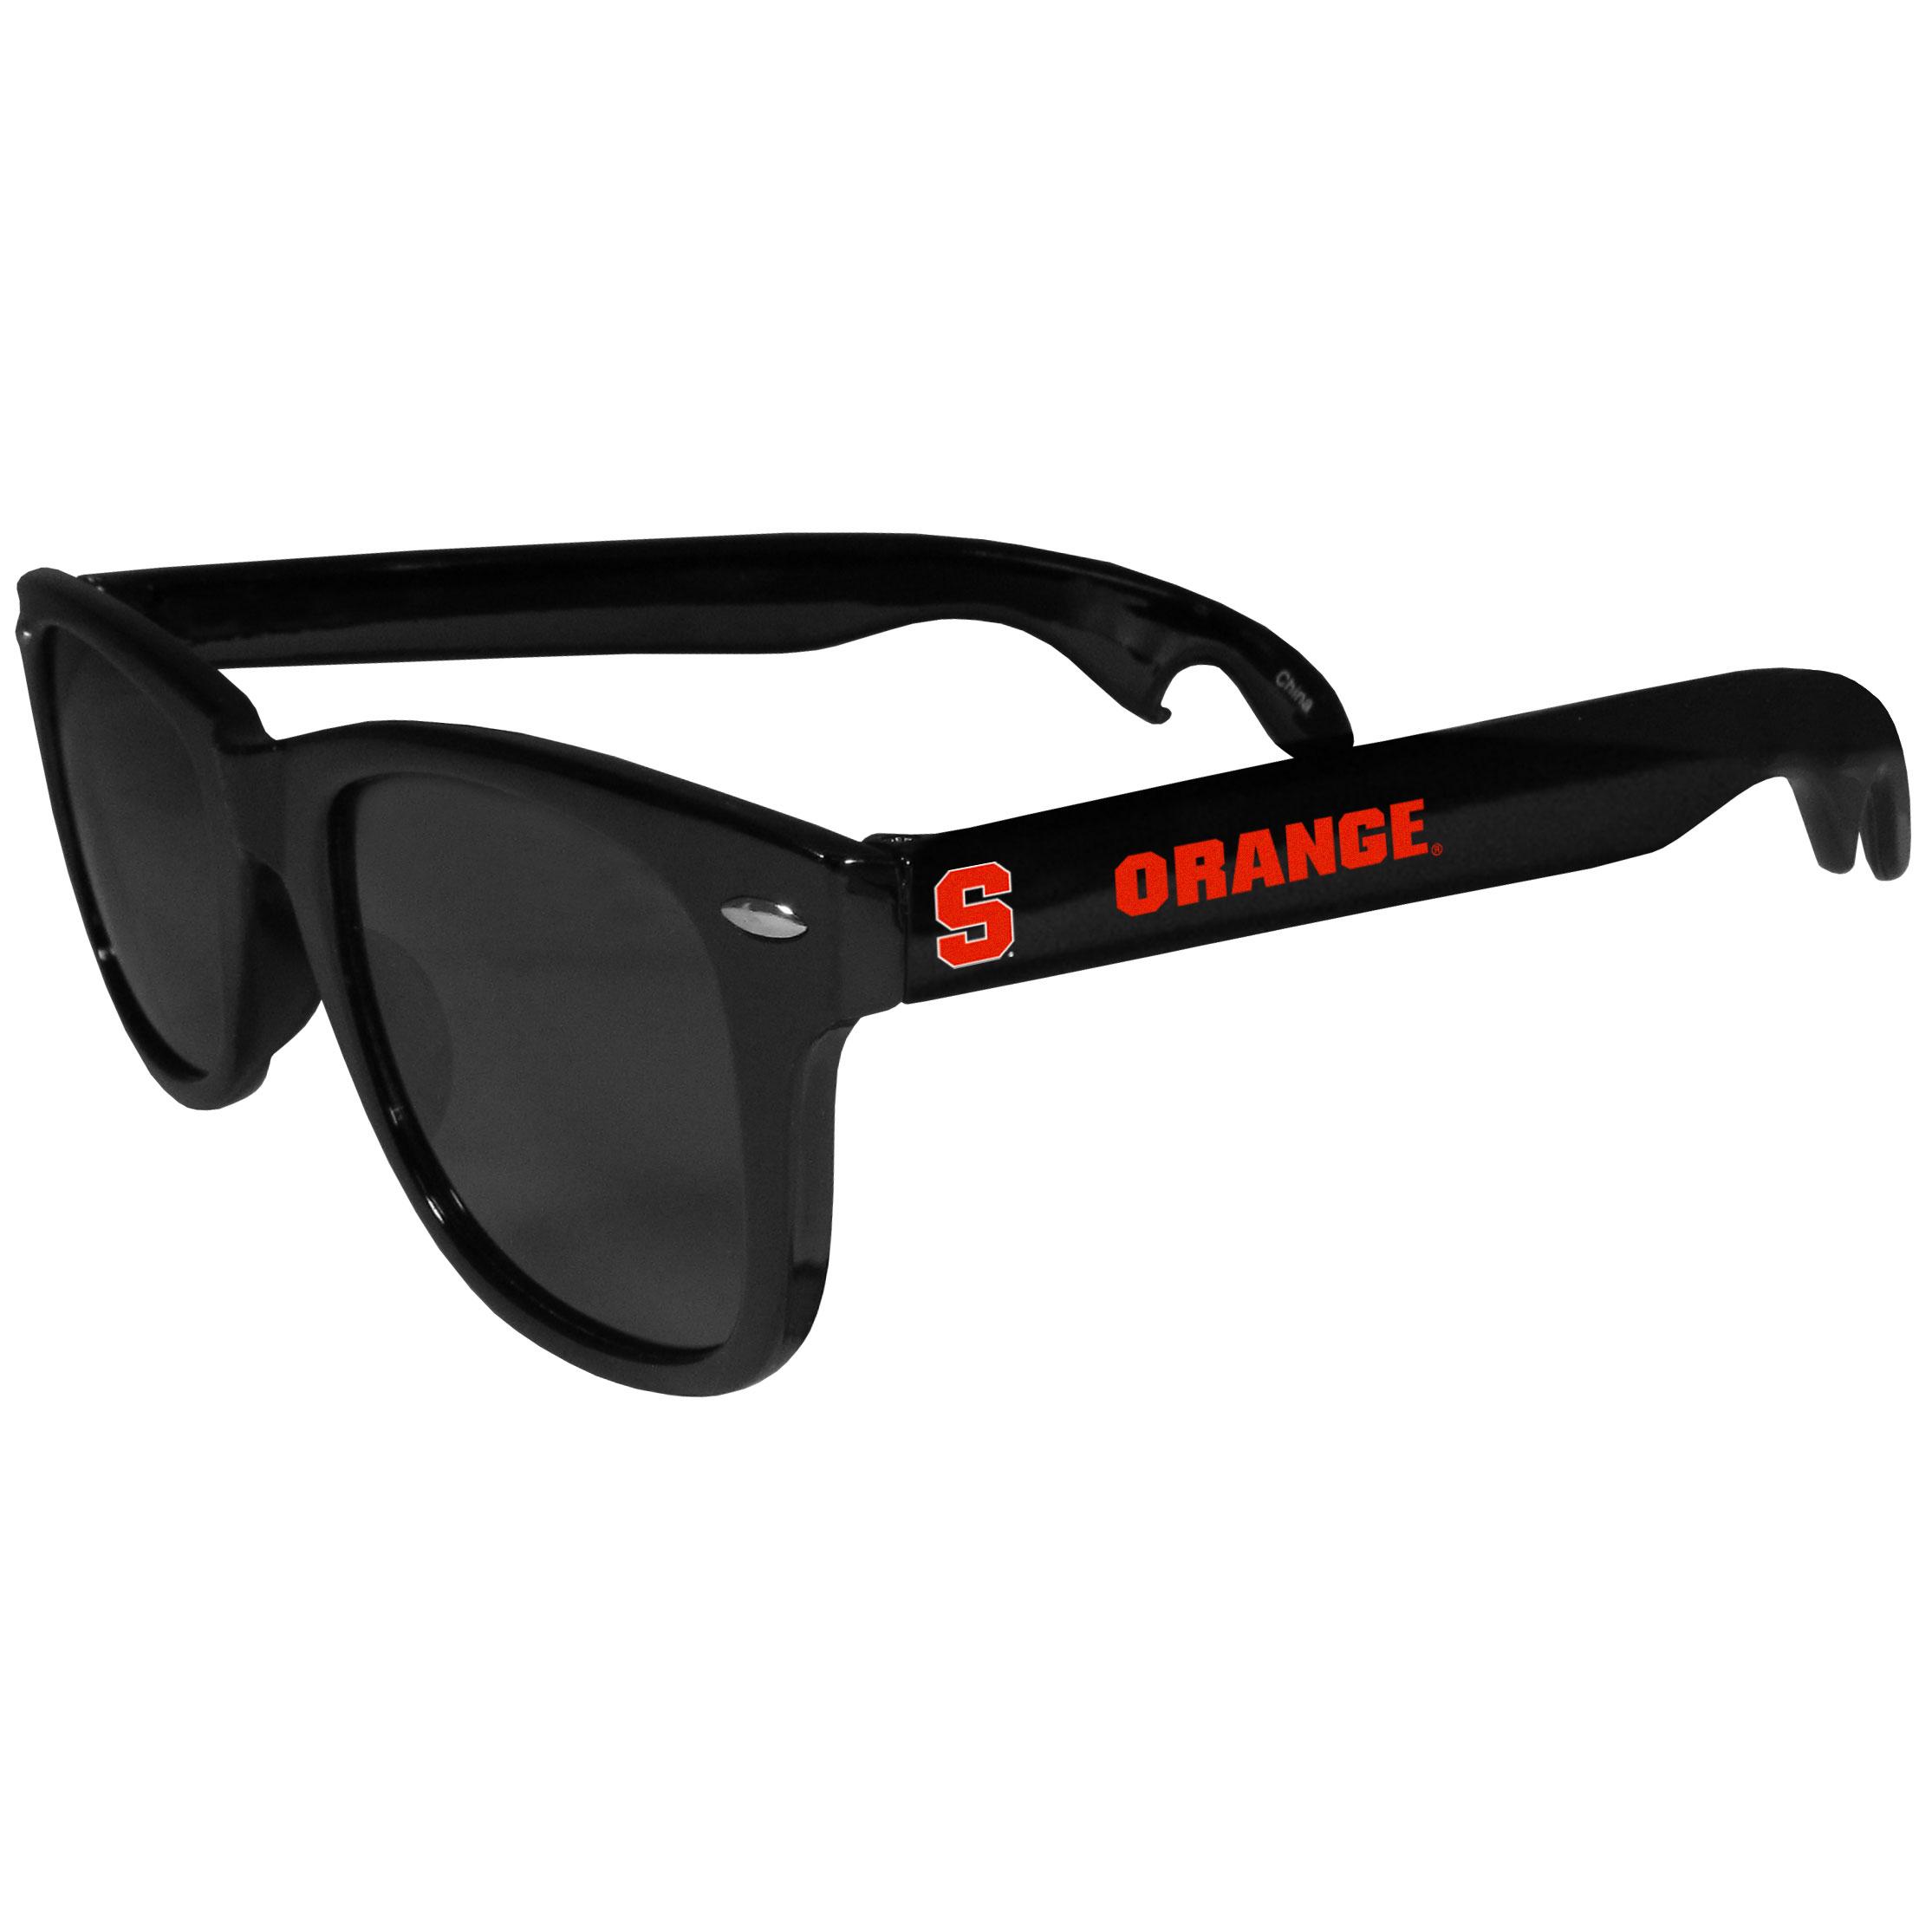 Syracuse Orange Beachfarer Bottle Opener Sunglasses